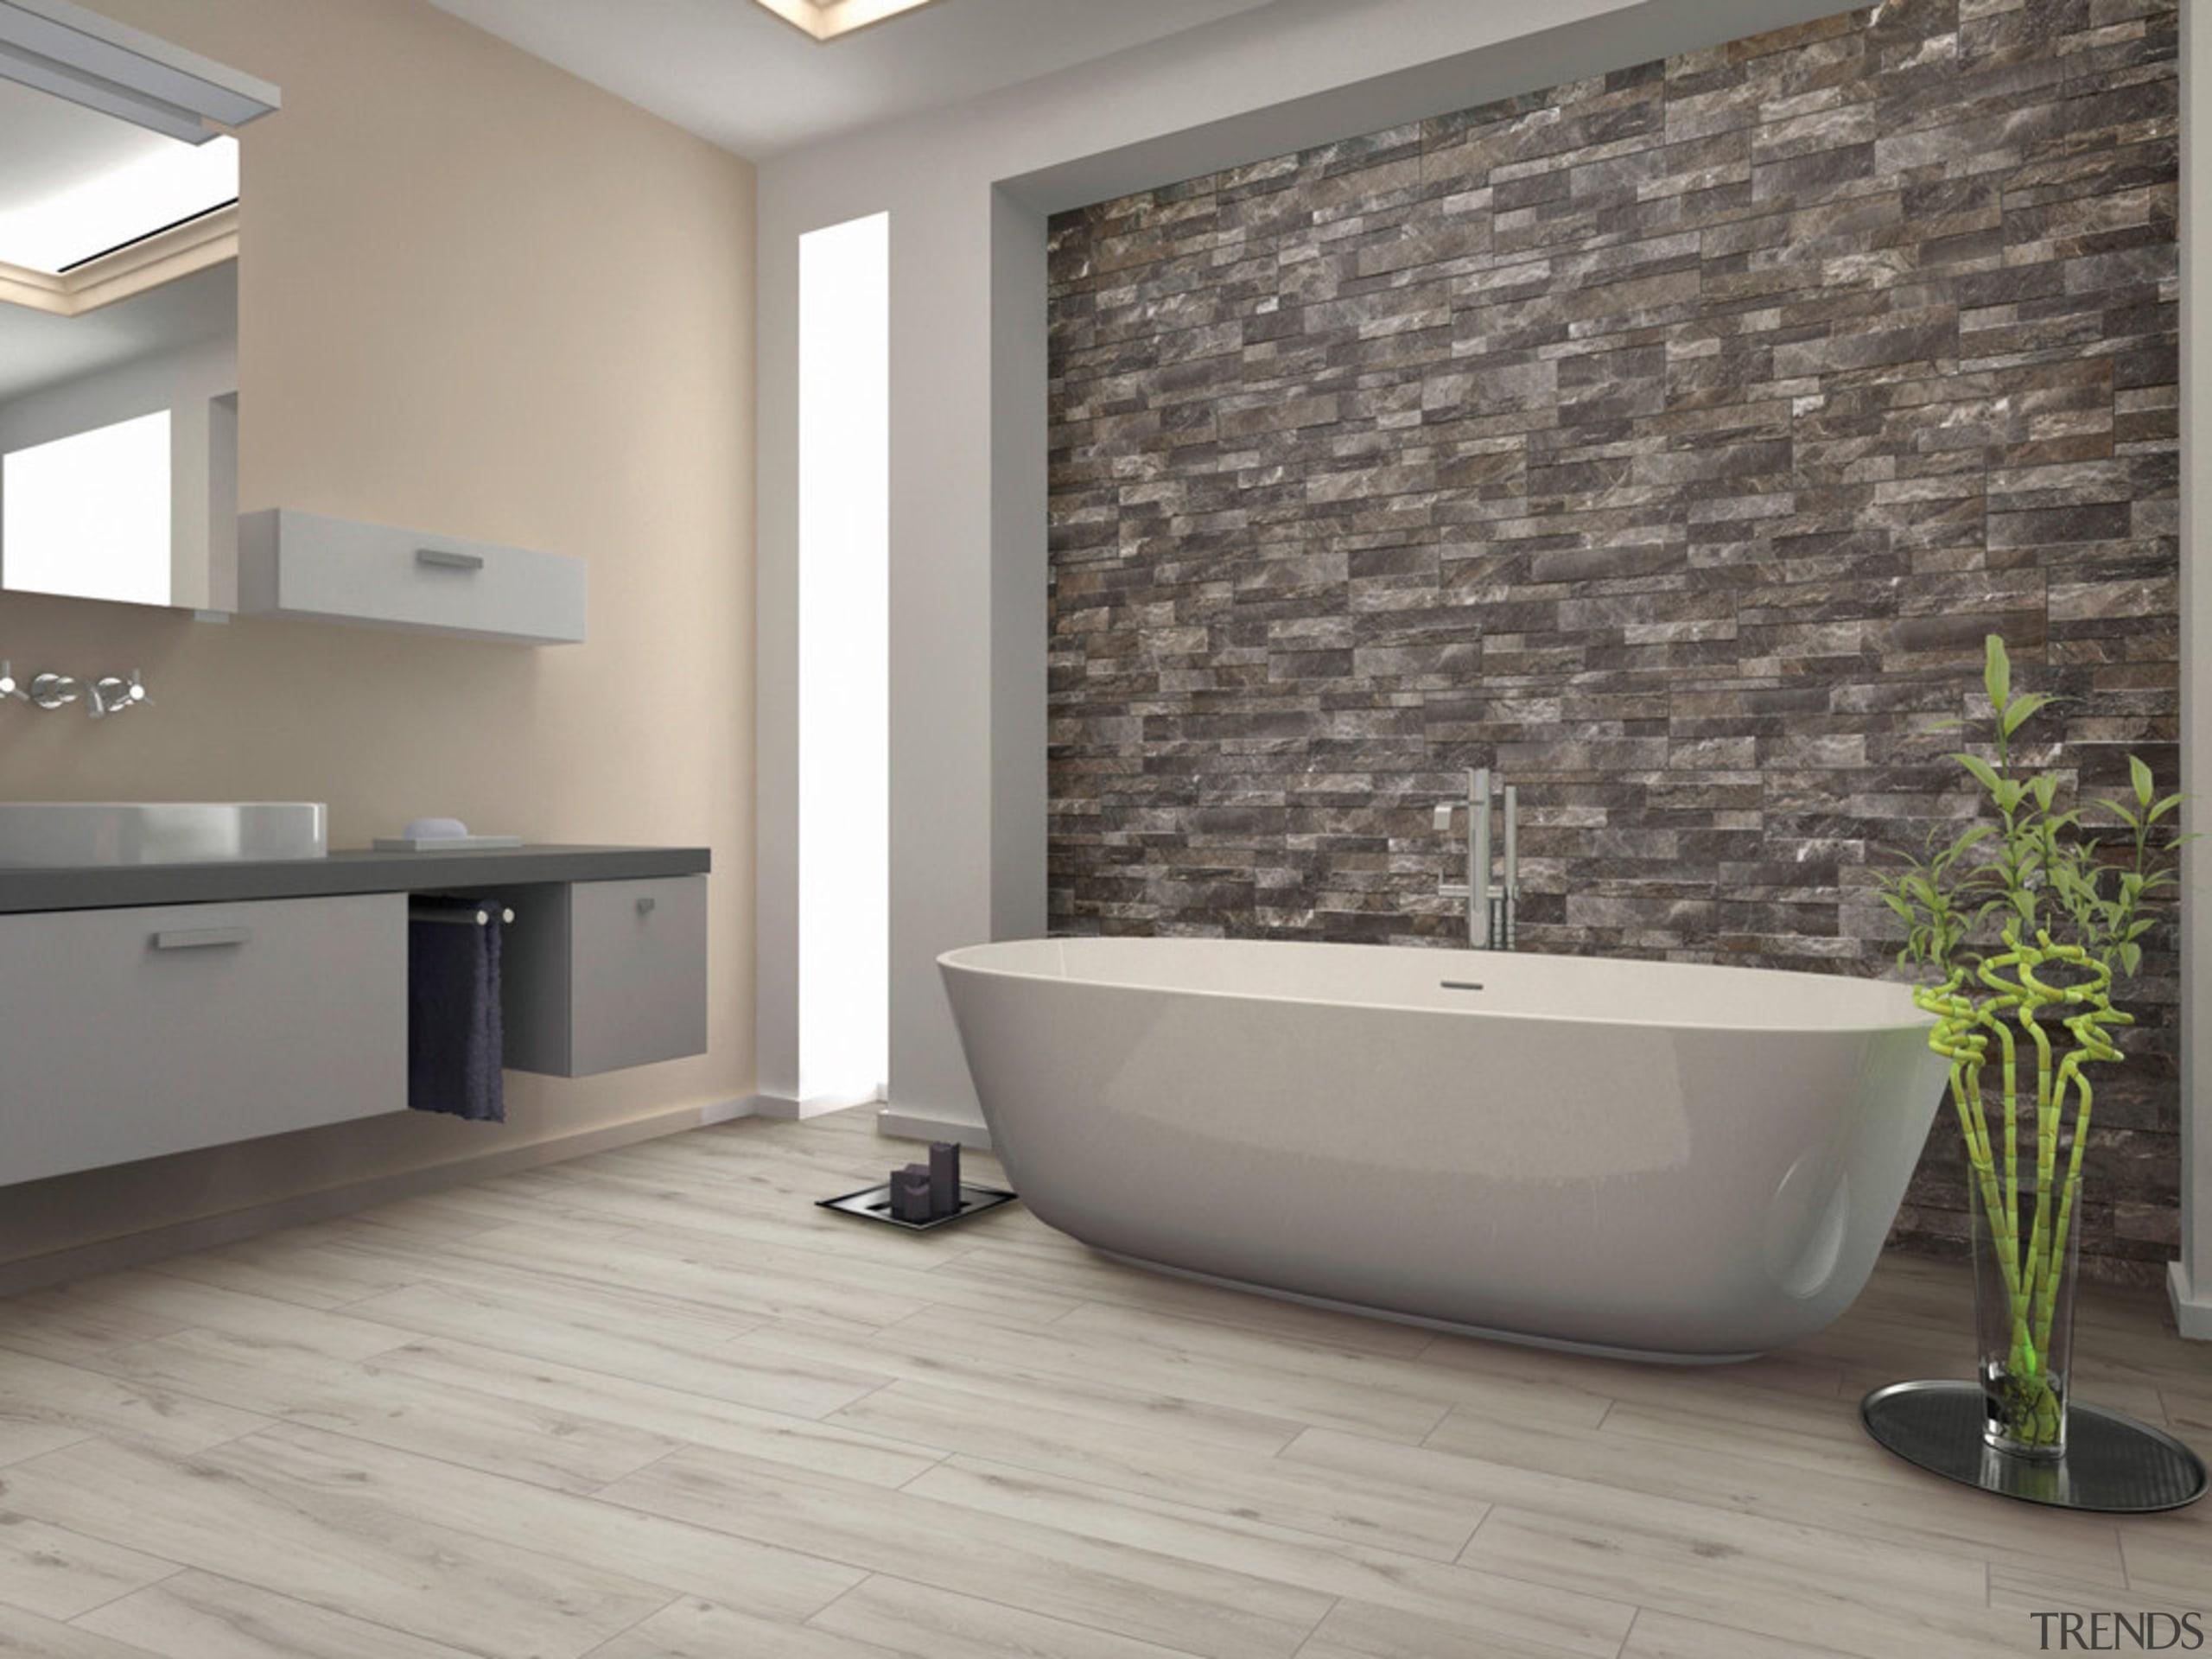 Gioia Greige 150x610 - Gioia Greige 150x610 - bathroom, floor, flooring, interior design, plumbing fixture, tap, tile, wall, gray